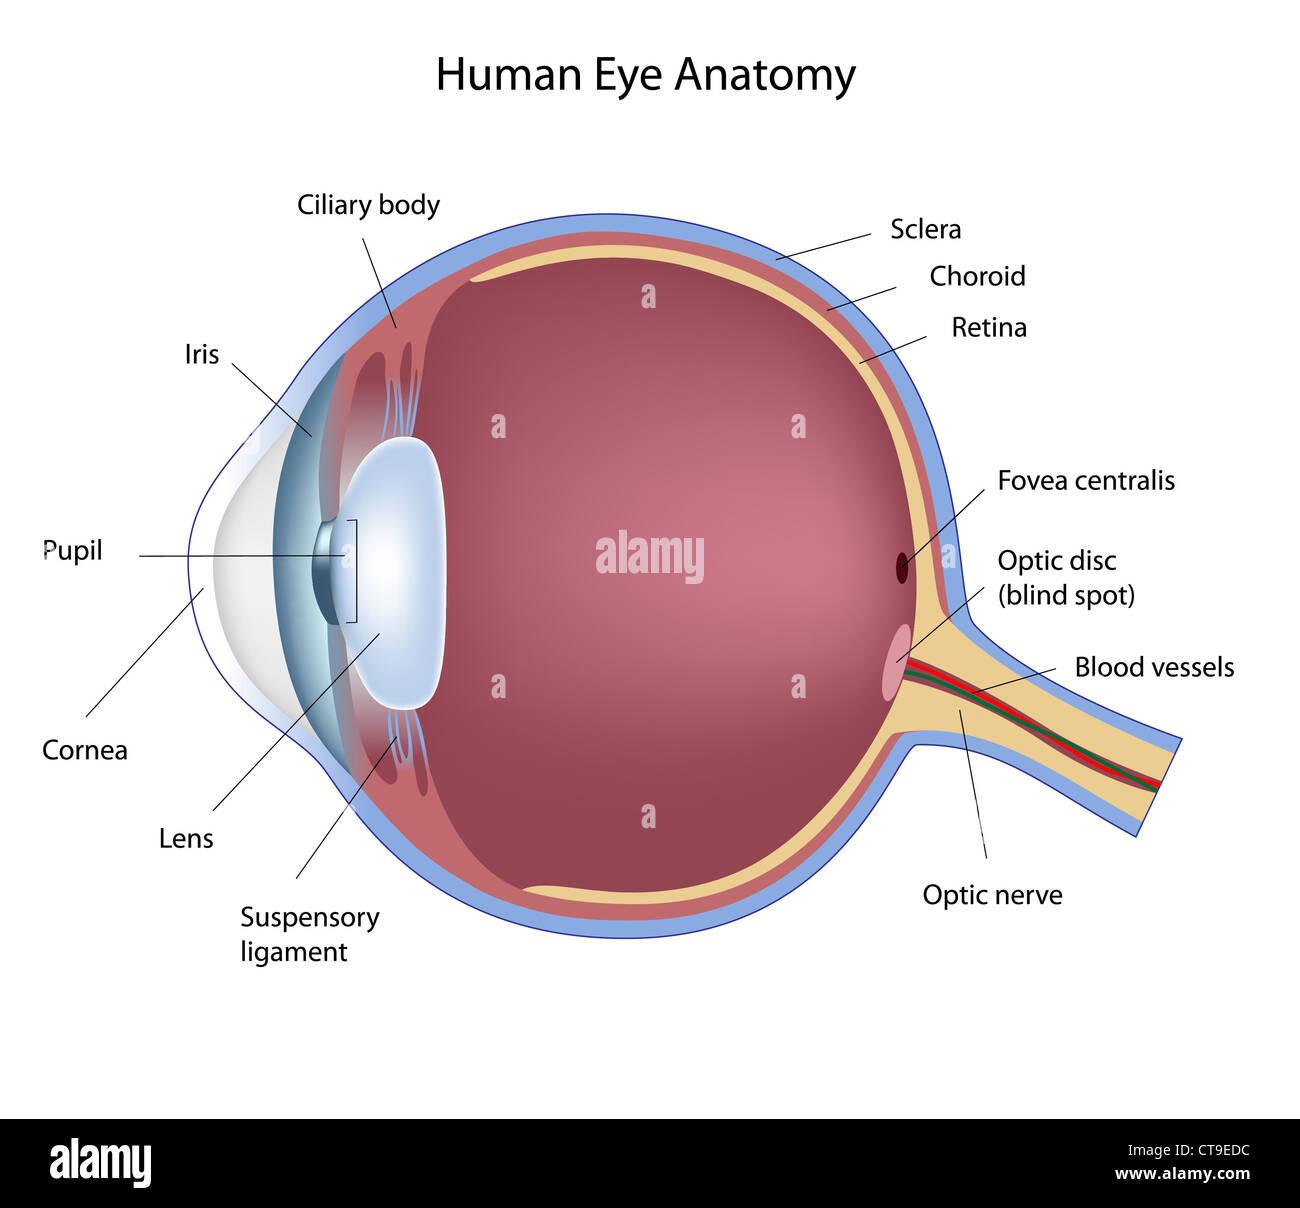 Human eye diagram stock photos human eye diagram stock images alamy cross section of human eye stock image ccuart Choice Image